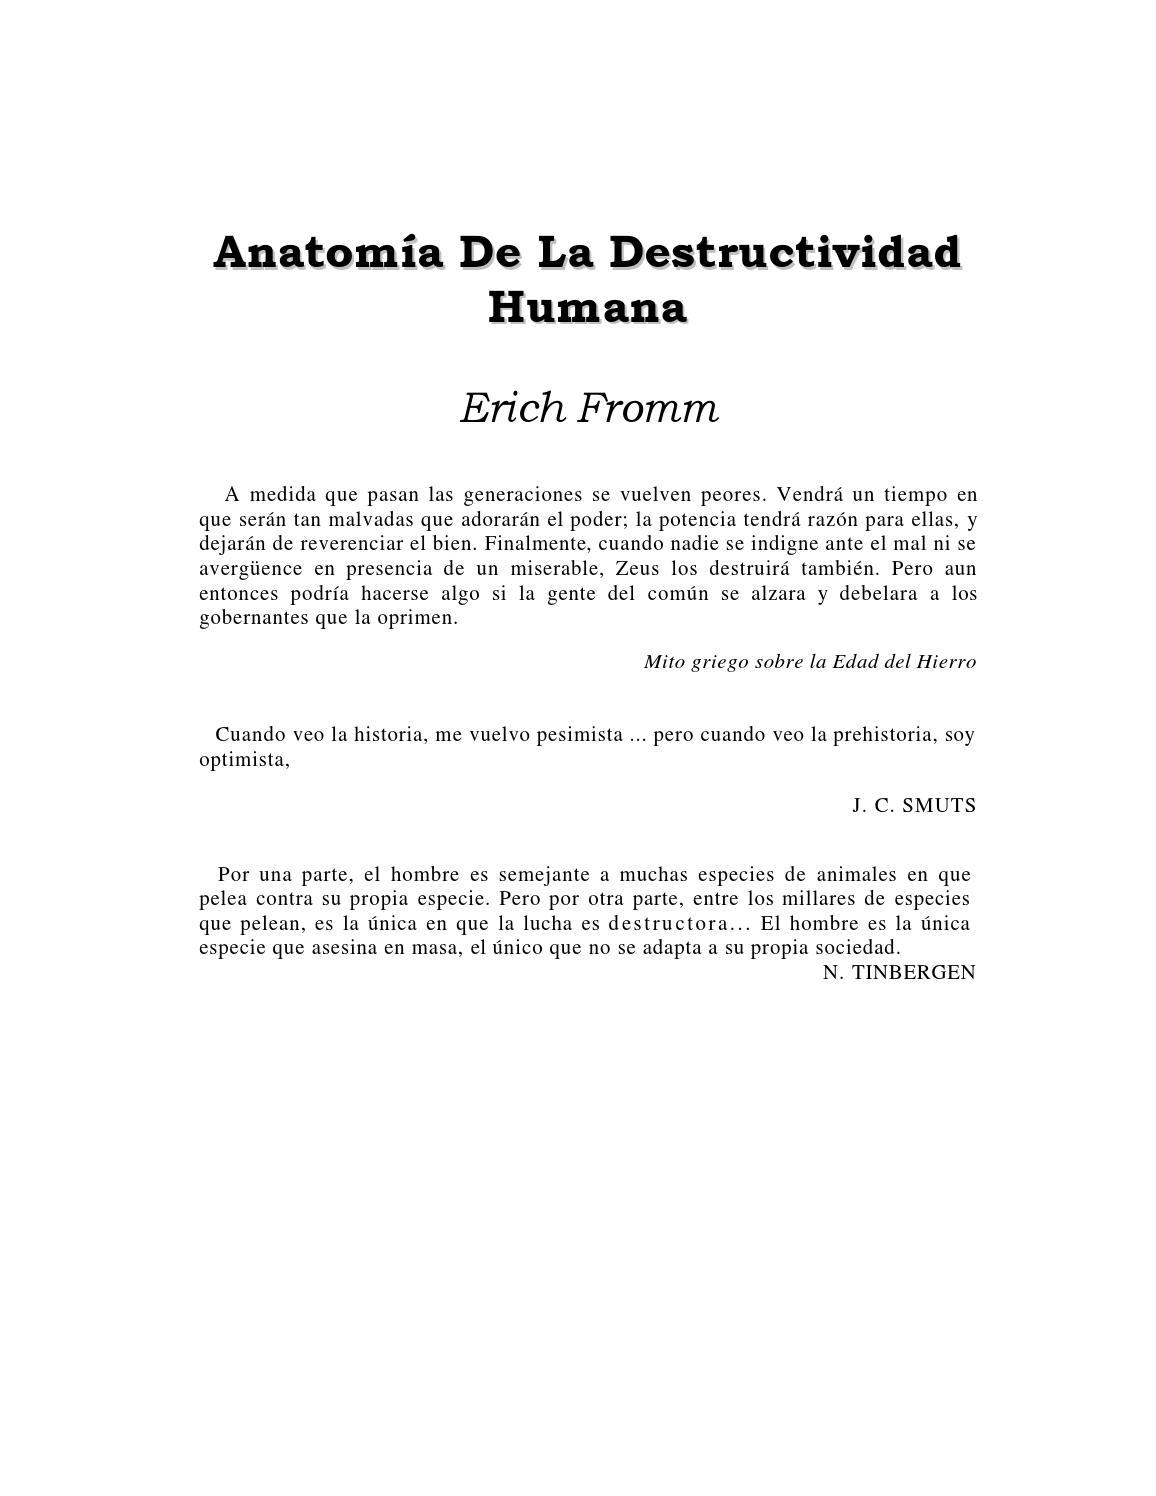 Erich Fromm - Anatomía De La Destructividad Humana by Dis Edson - issuu